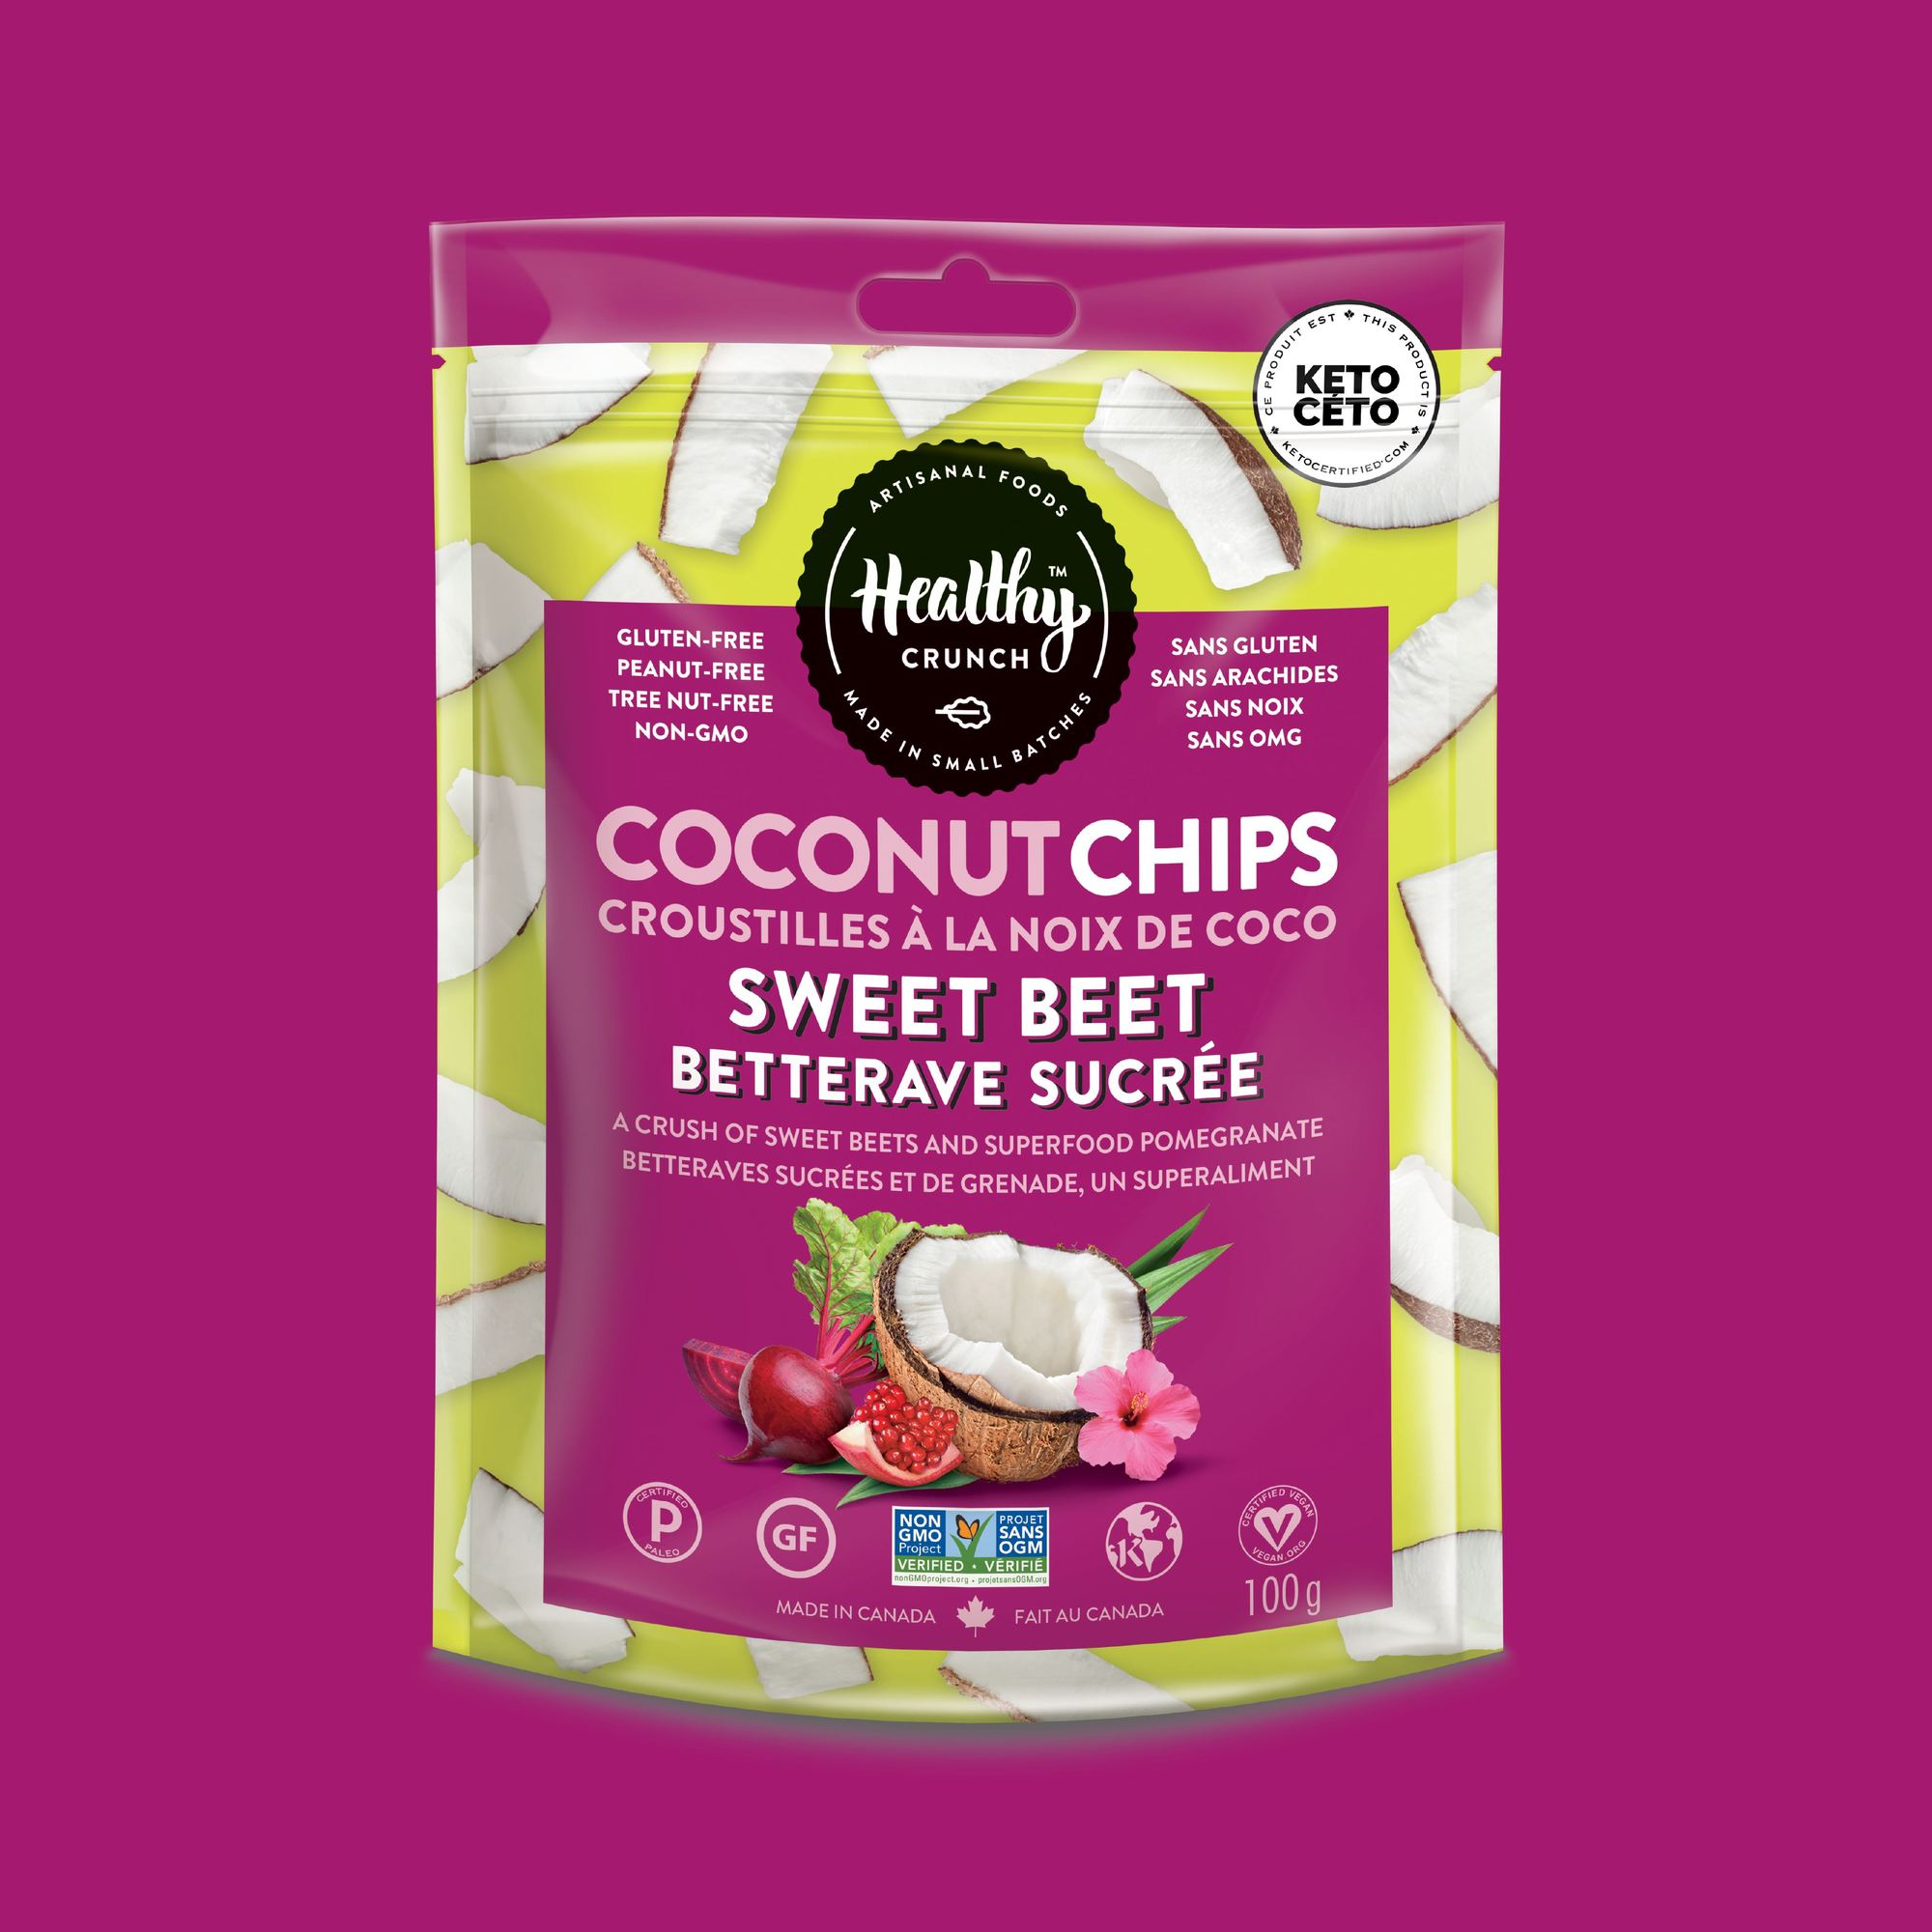 Sweet Beet Coconut Chips